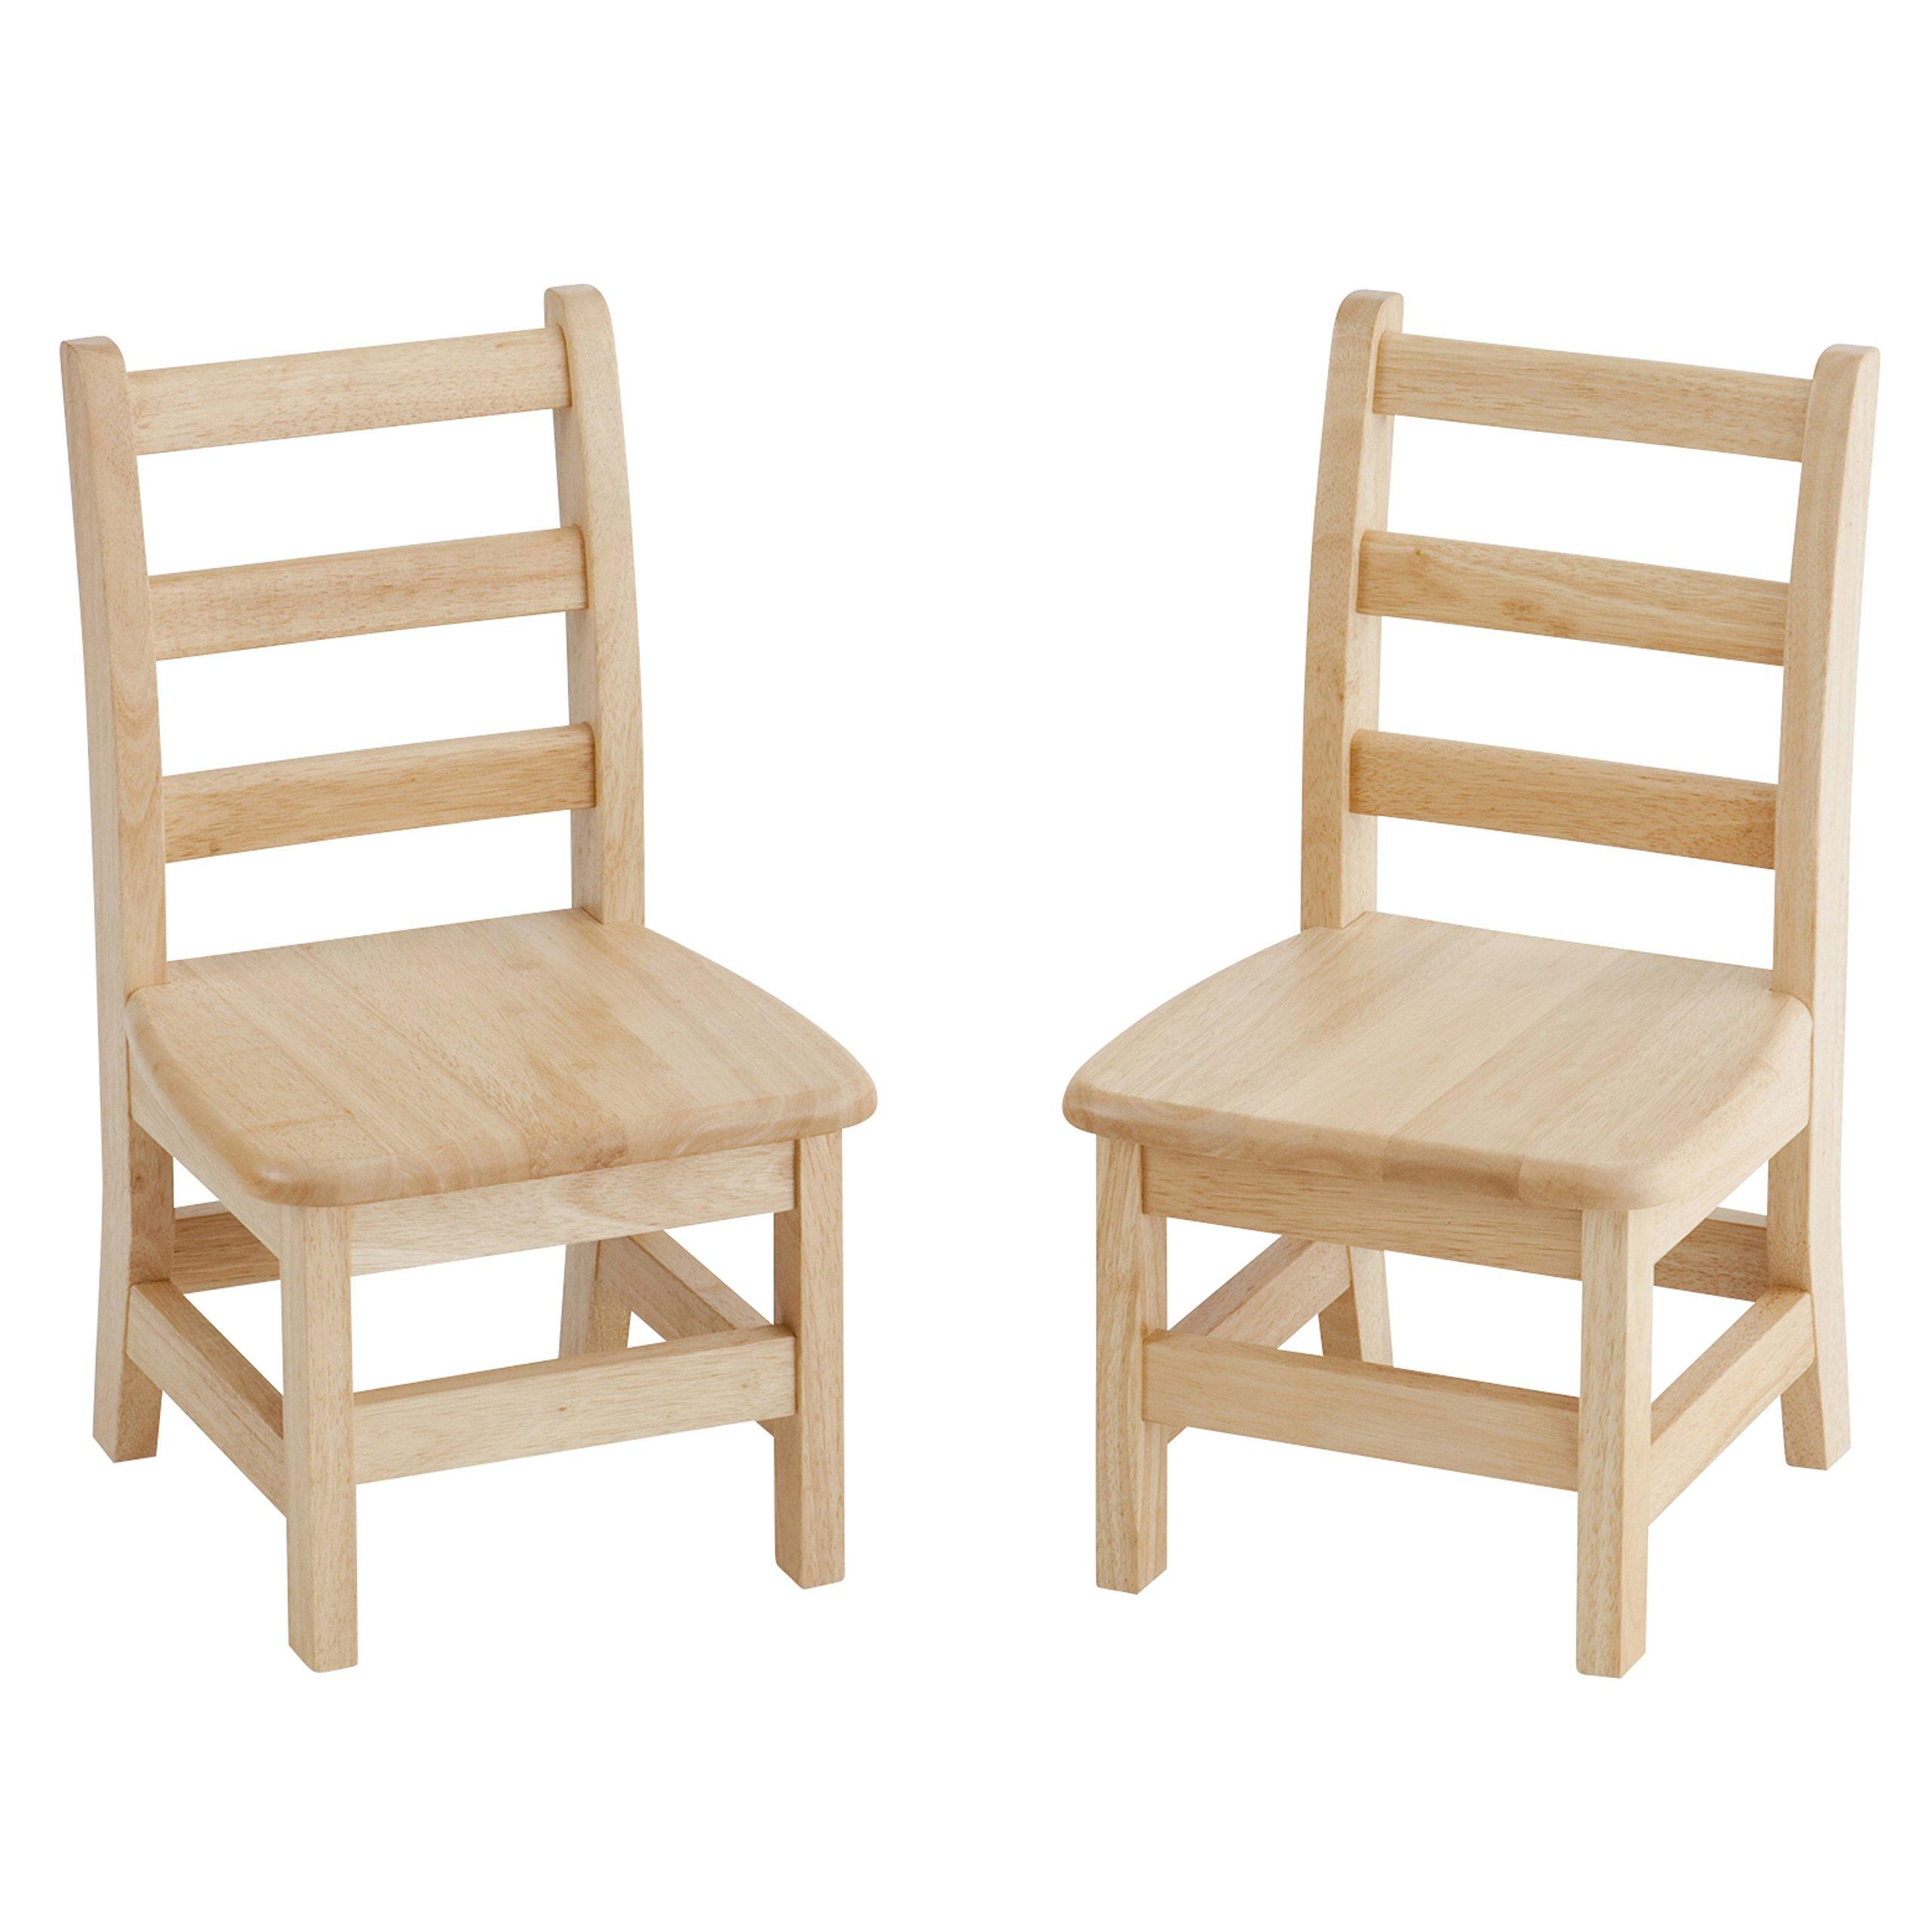 ECR4Kids 10'' Hardwood 3-Rung Ladderback Chair, Natural (2-Pack)